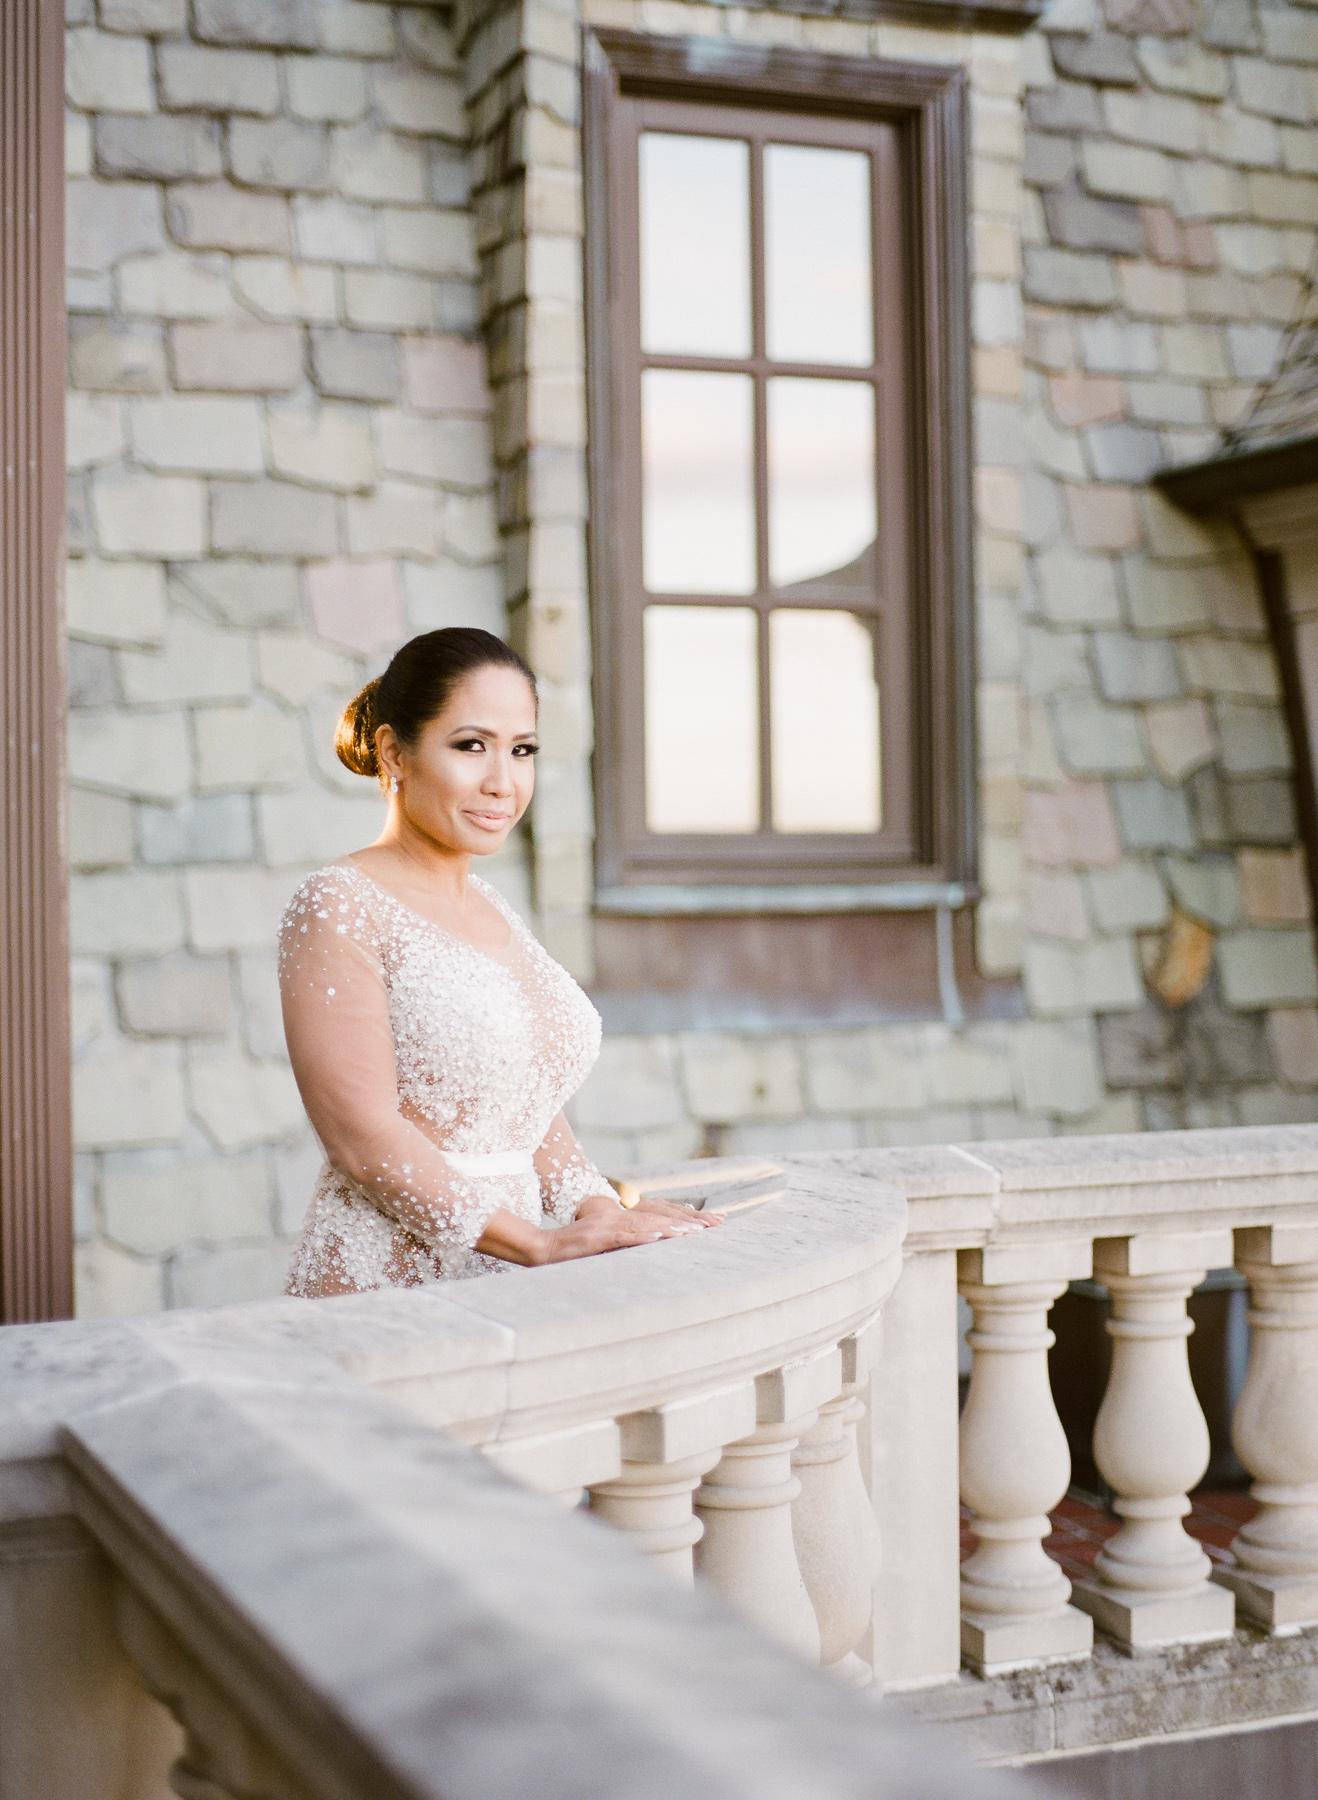 Brian-McKnight-wedding-oheka-castle-038.jpg